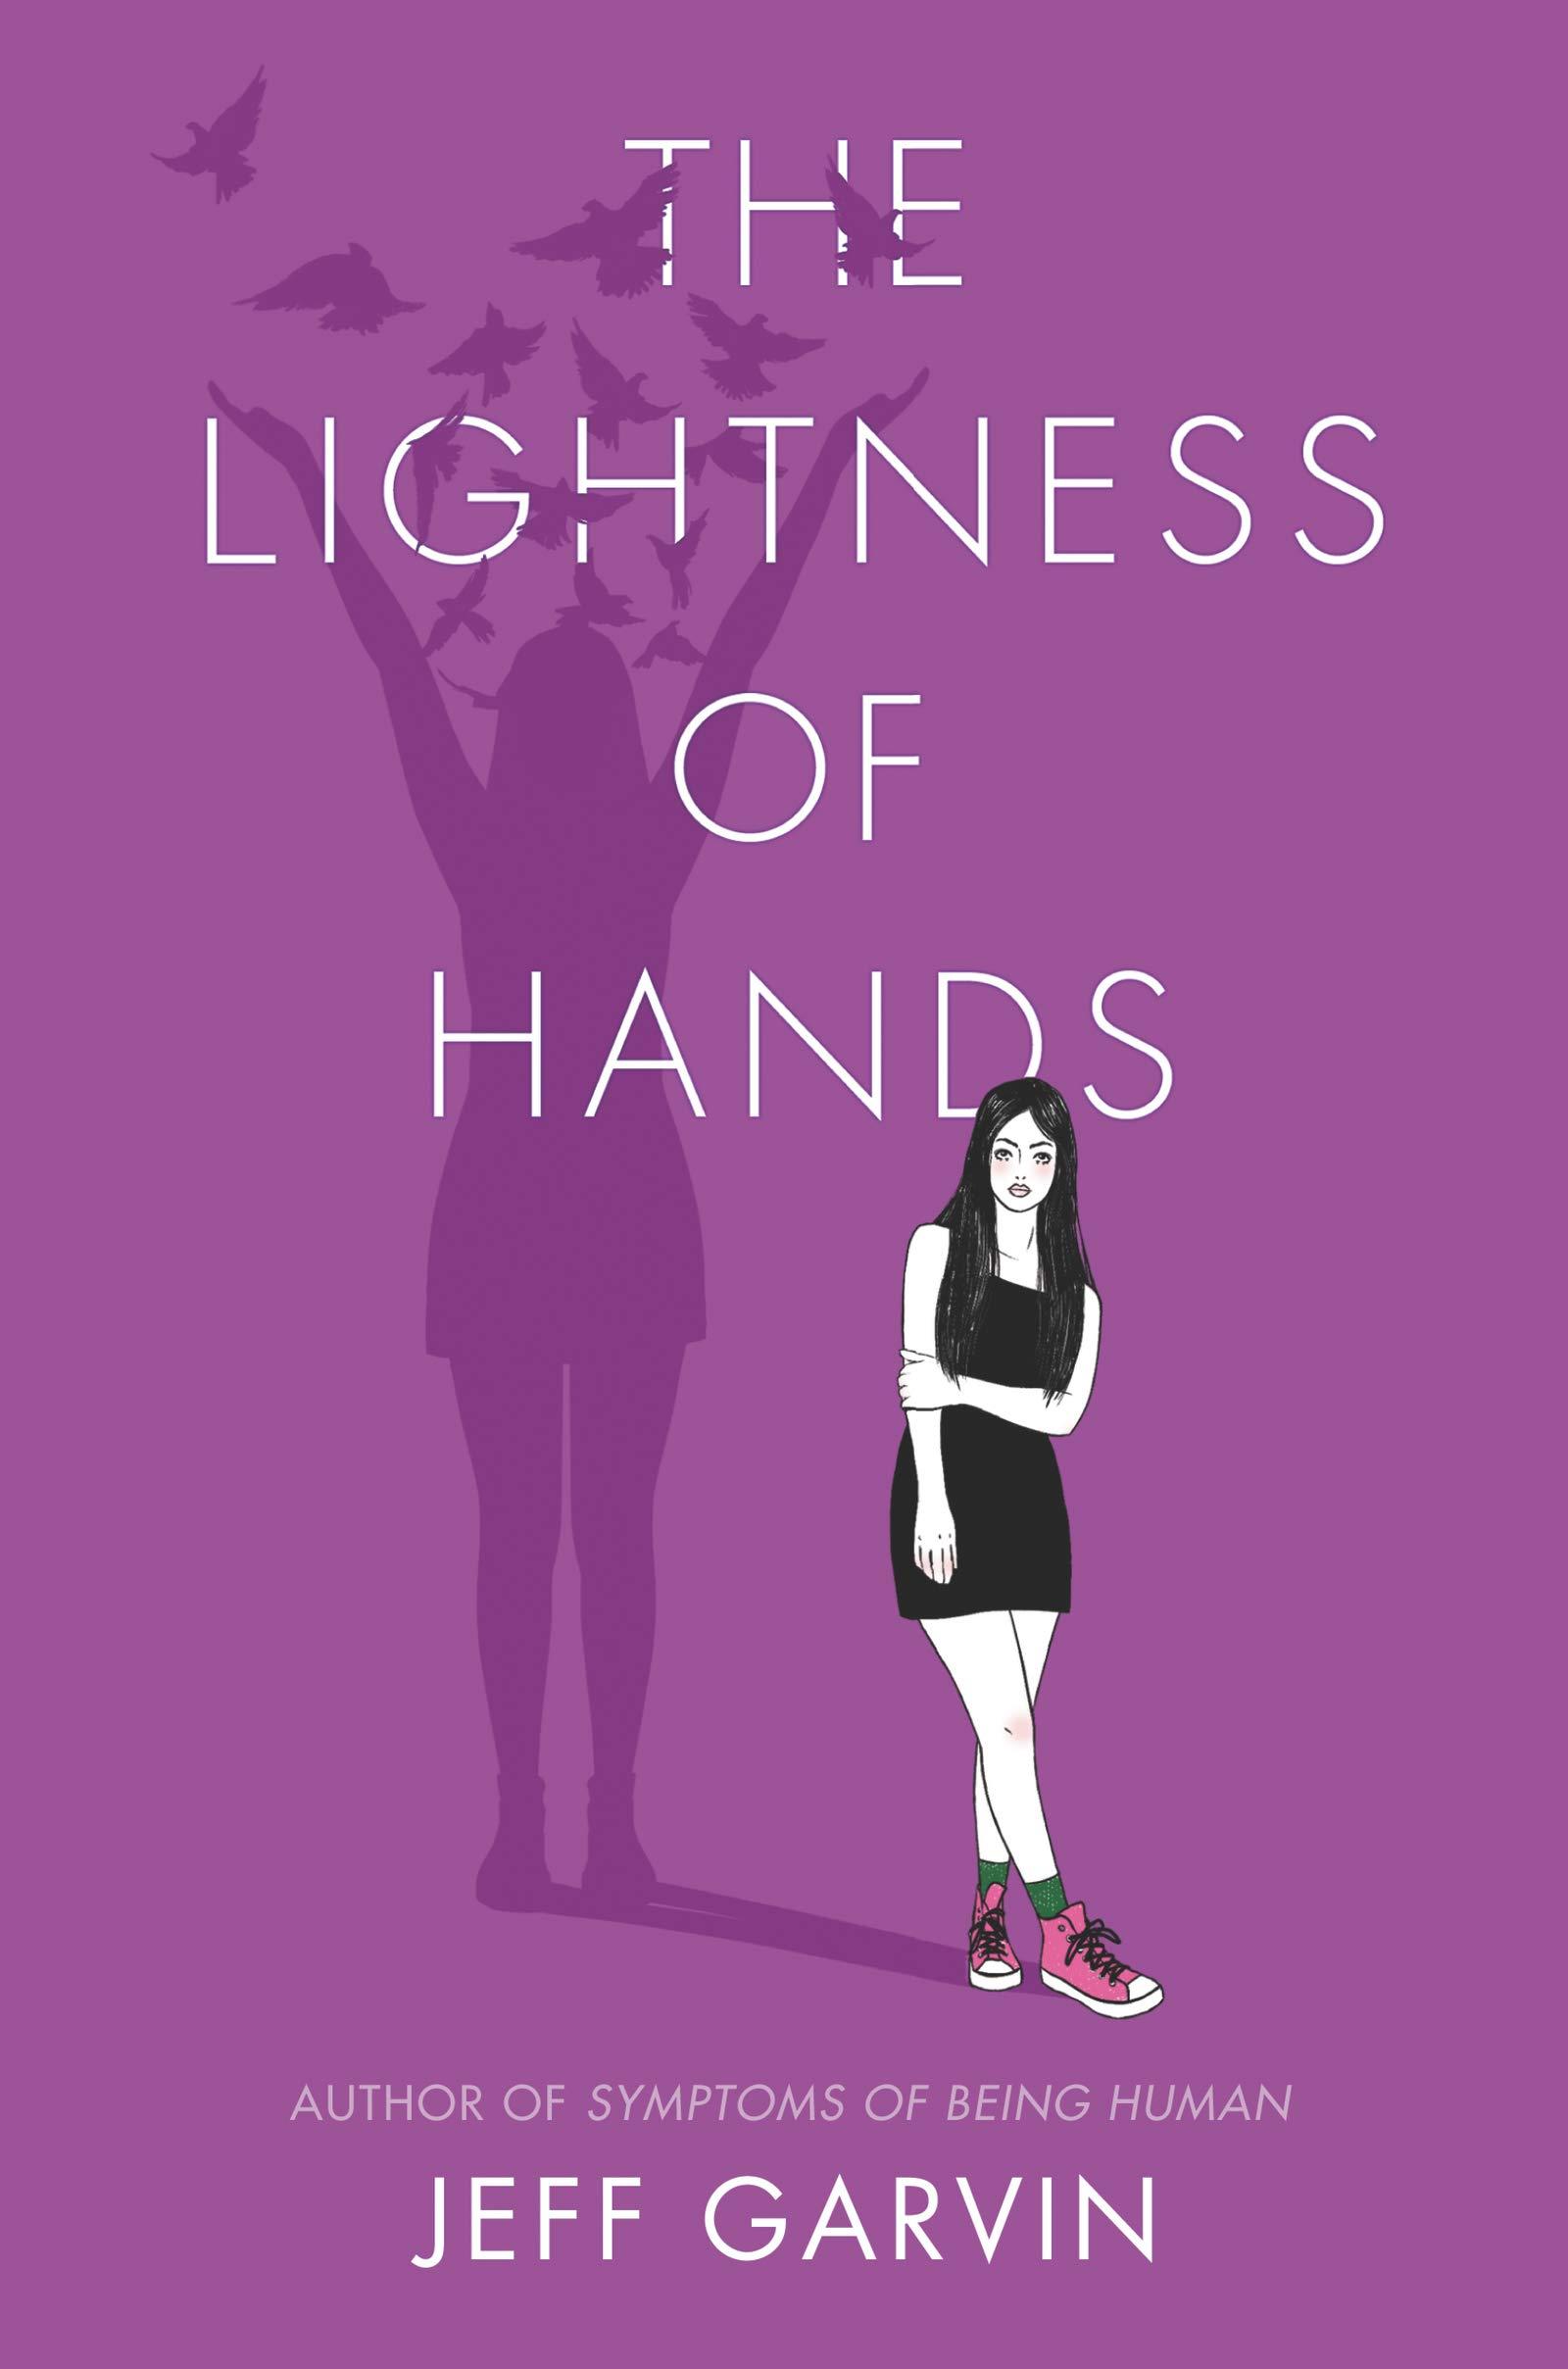 Amazon.com: The Lightness of Hands (9780062382894): Garvin, Jeff ...